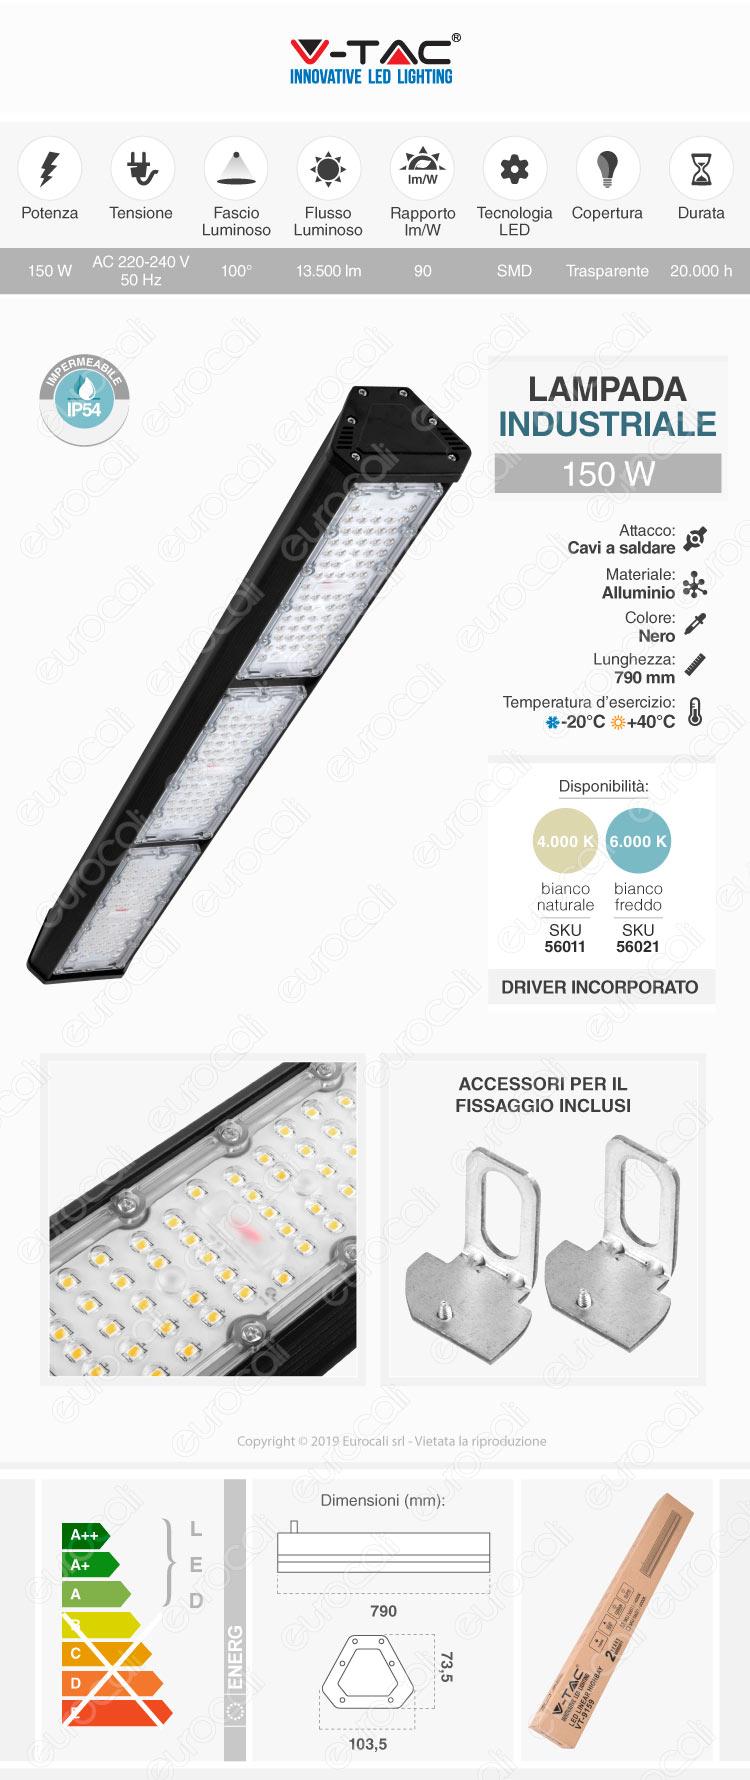 V-Tac VT-9159 Lampada Industriale LED Linear 150W SMD High Bay